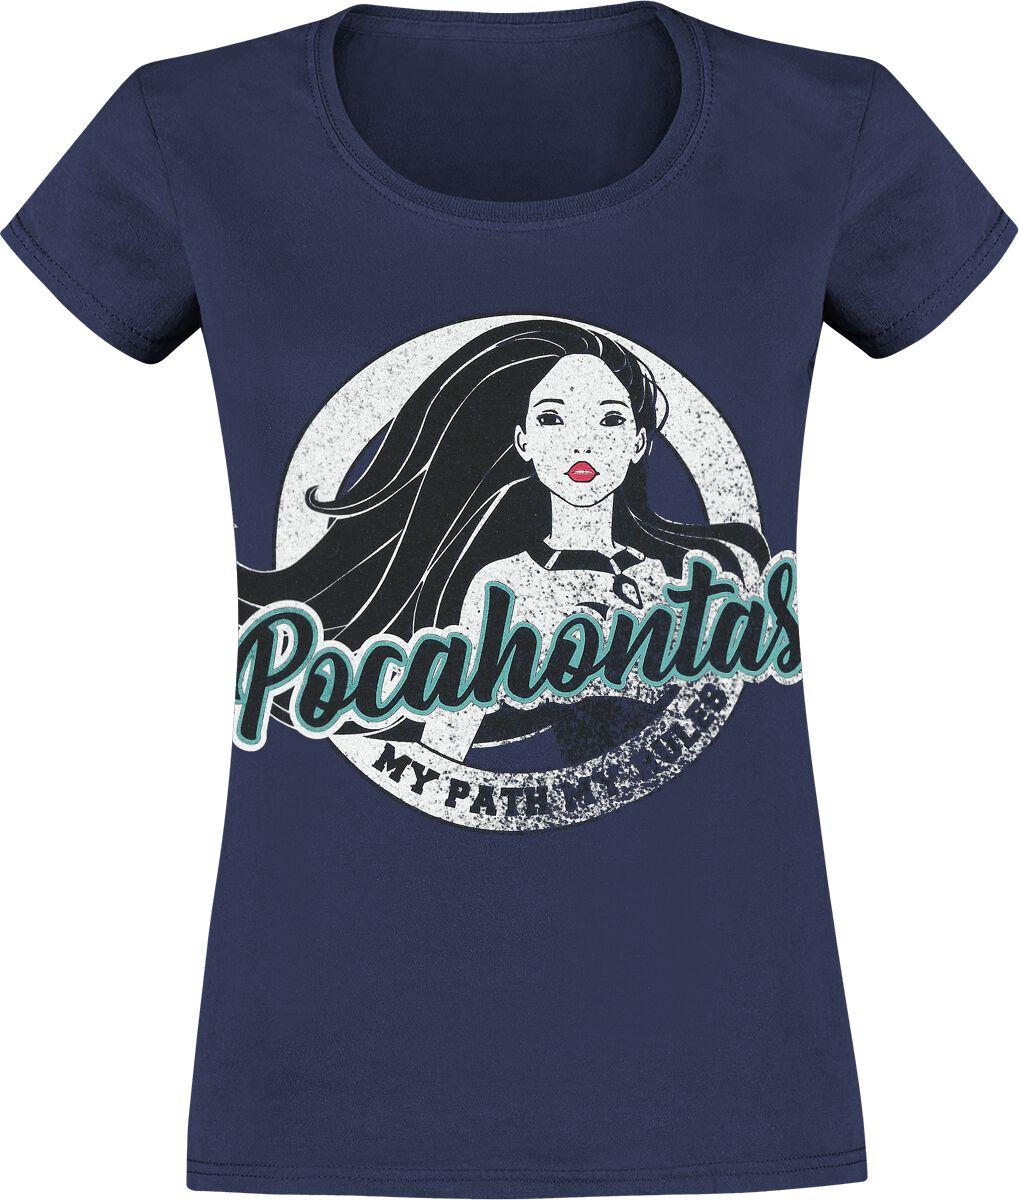 Pocahontas Disc Koszulka damska granatowy